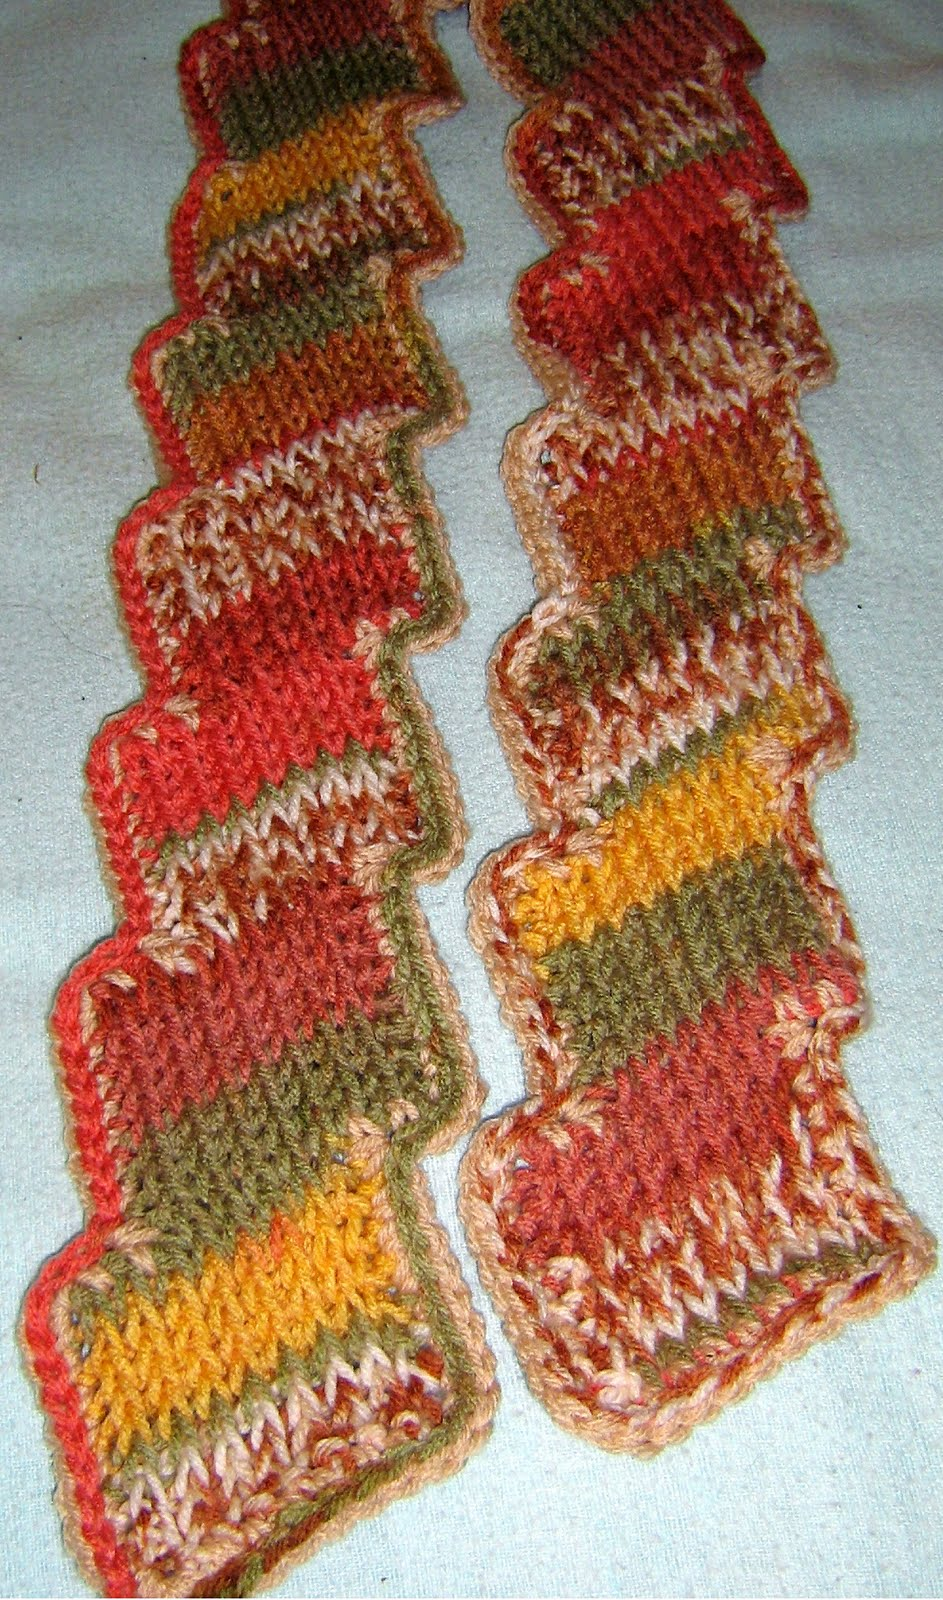 Crochet Patterns Quilt Blocks : TUMBLING BLOCK CROCHET PATTERN